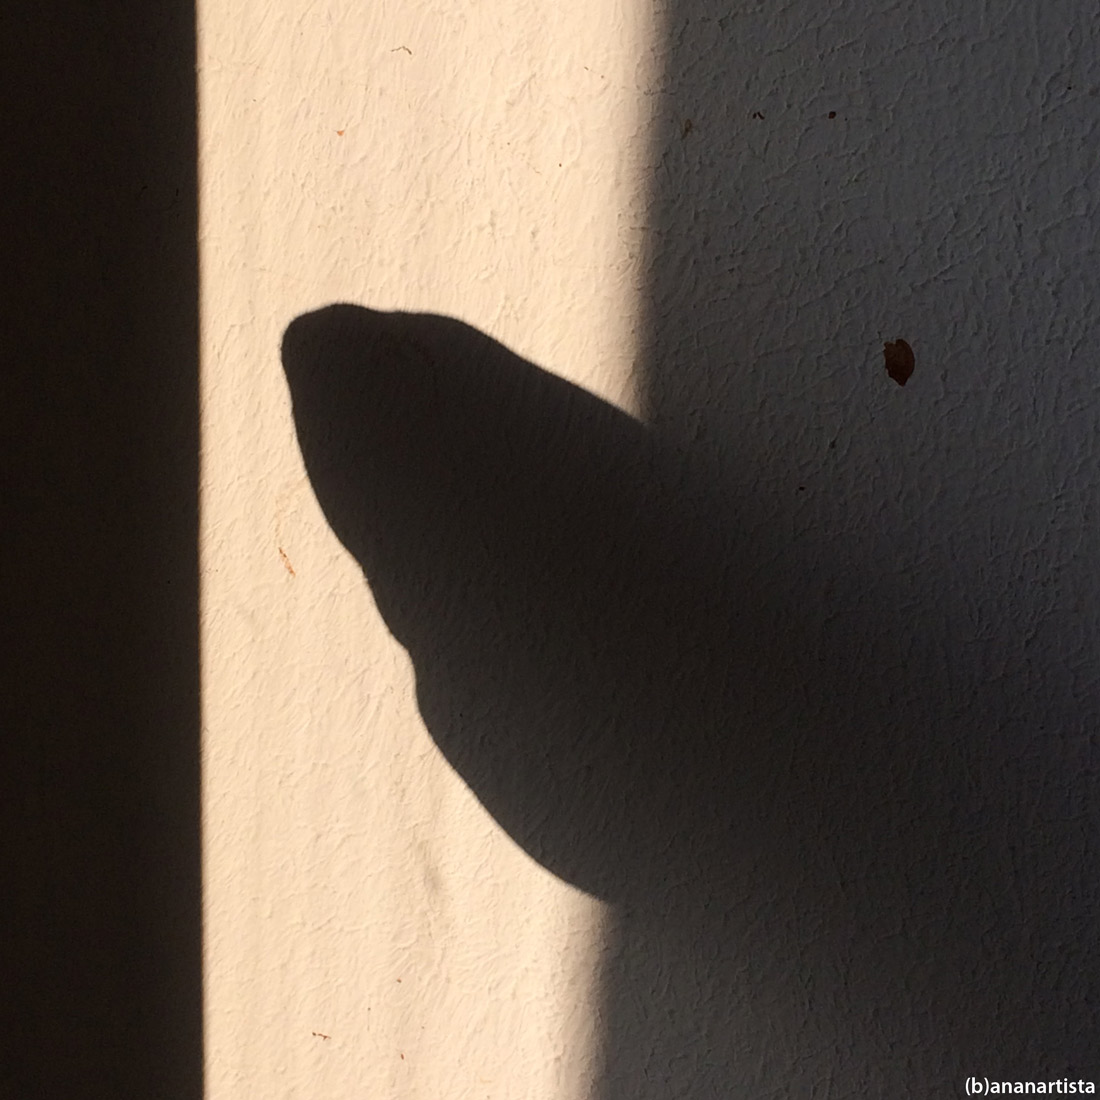 the mystery of dark matter: abstract minimal photography art by (b)ananartista sbuff